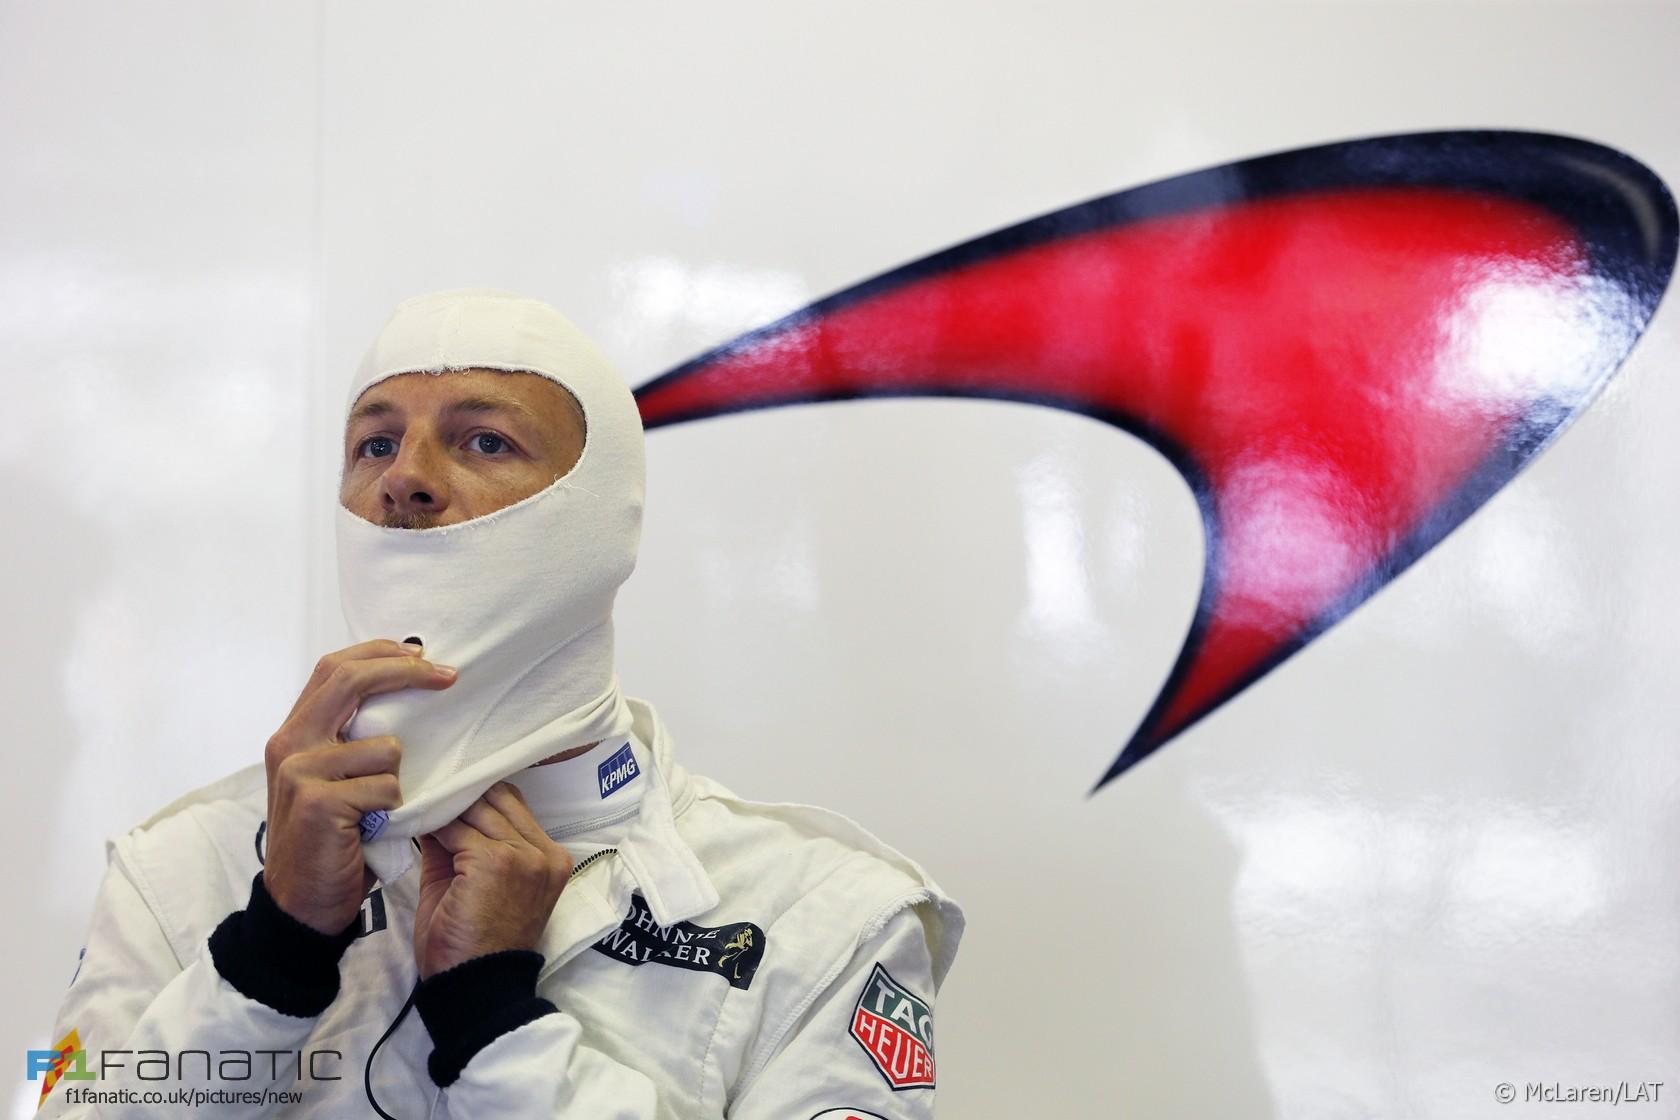 Jenson Button, McLaren, Hungaroring, 2015